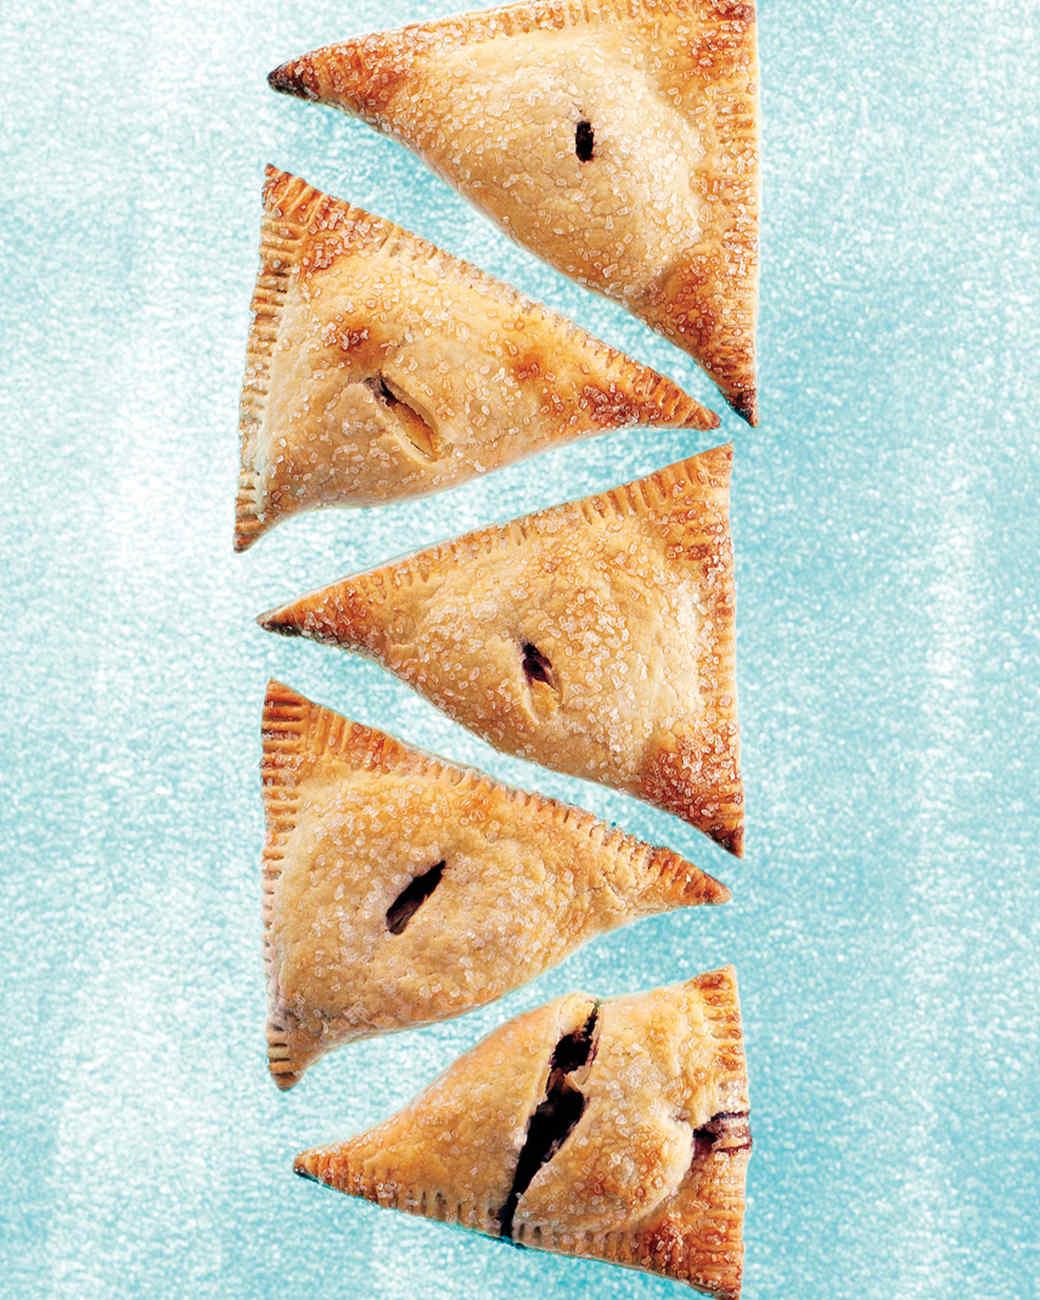 blueberry-cream-cheese-hand-pies-2-med108372.jpg